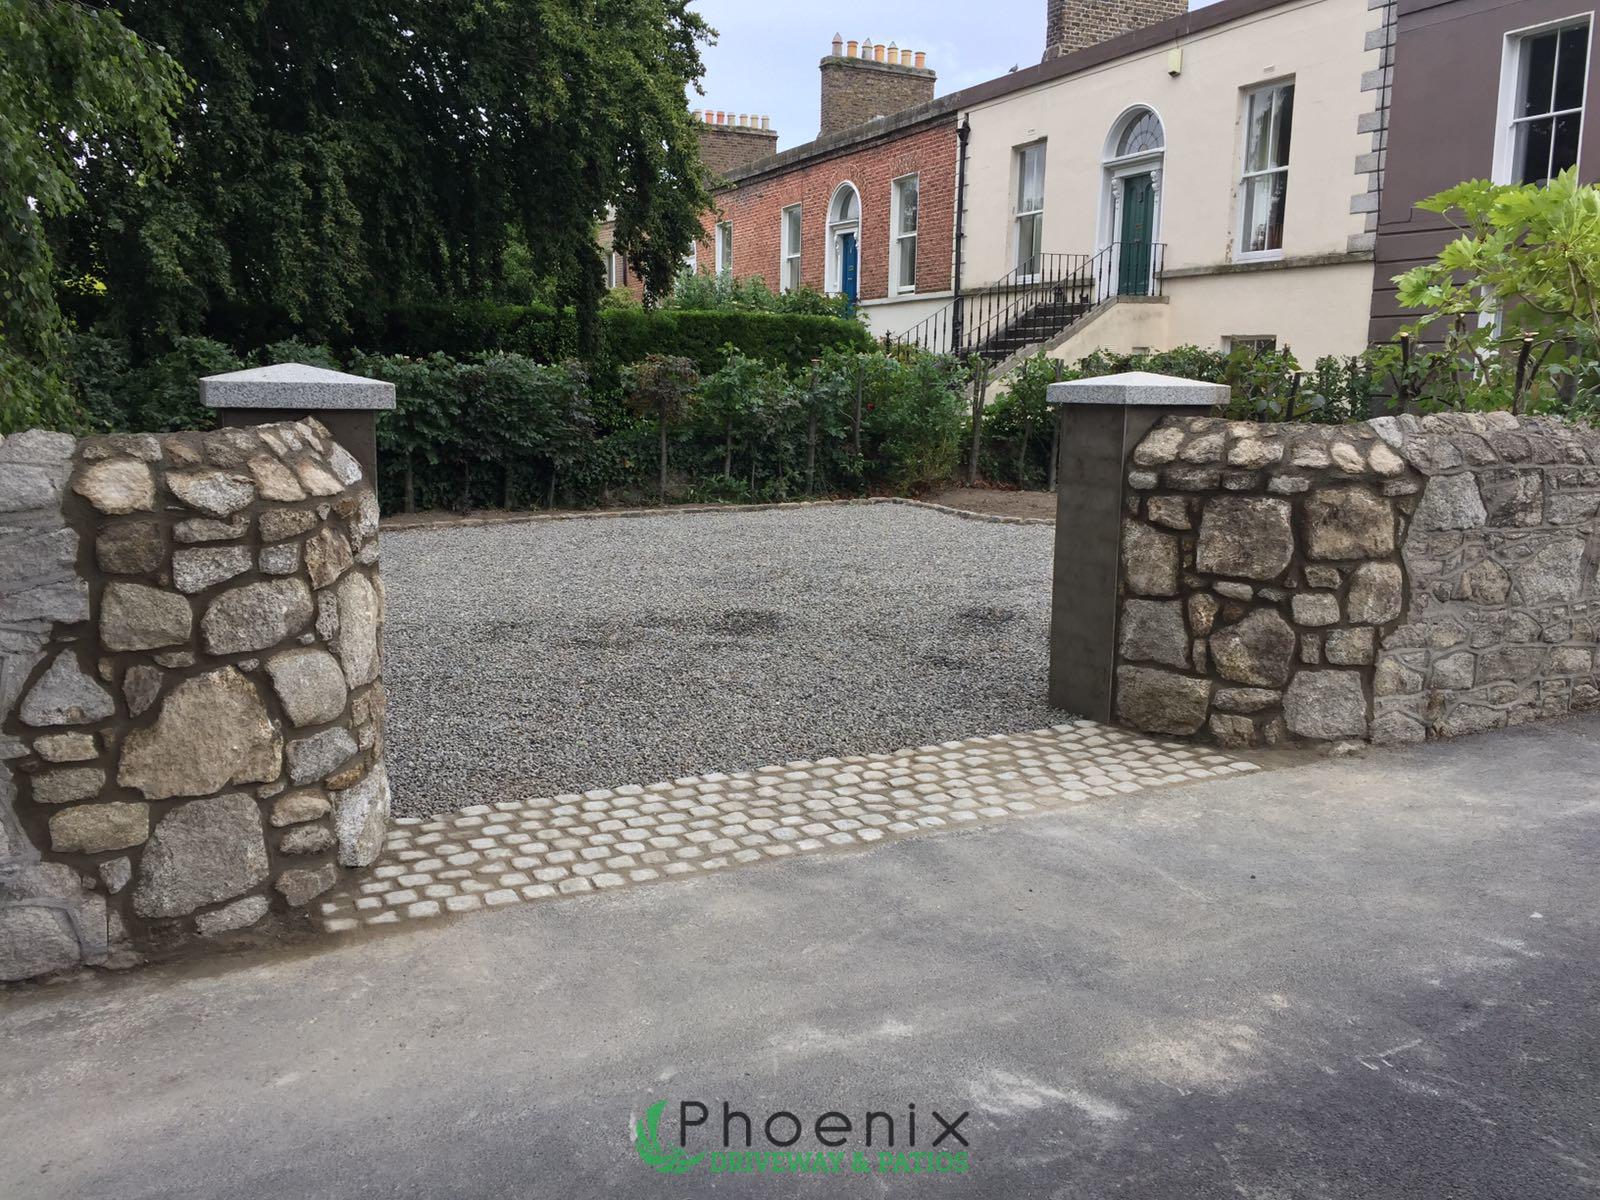 Rathgar, Dublin Gravel Driveway